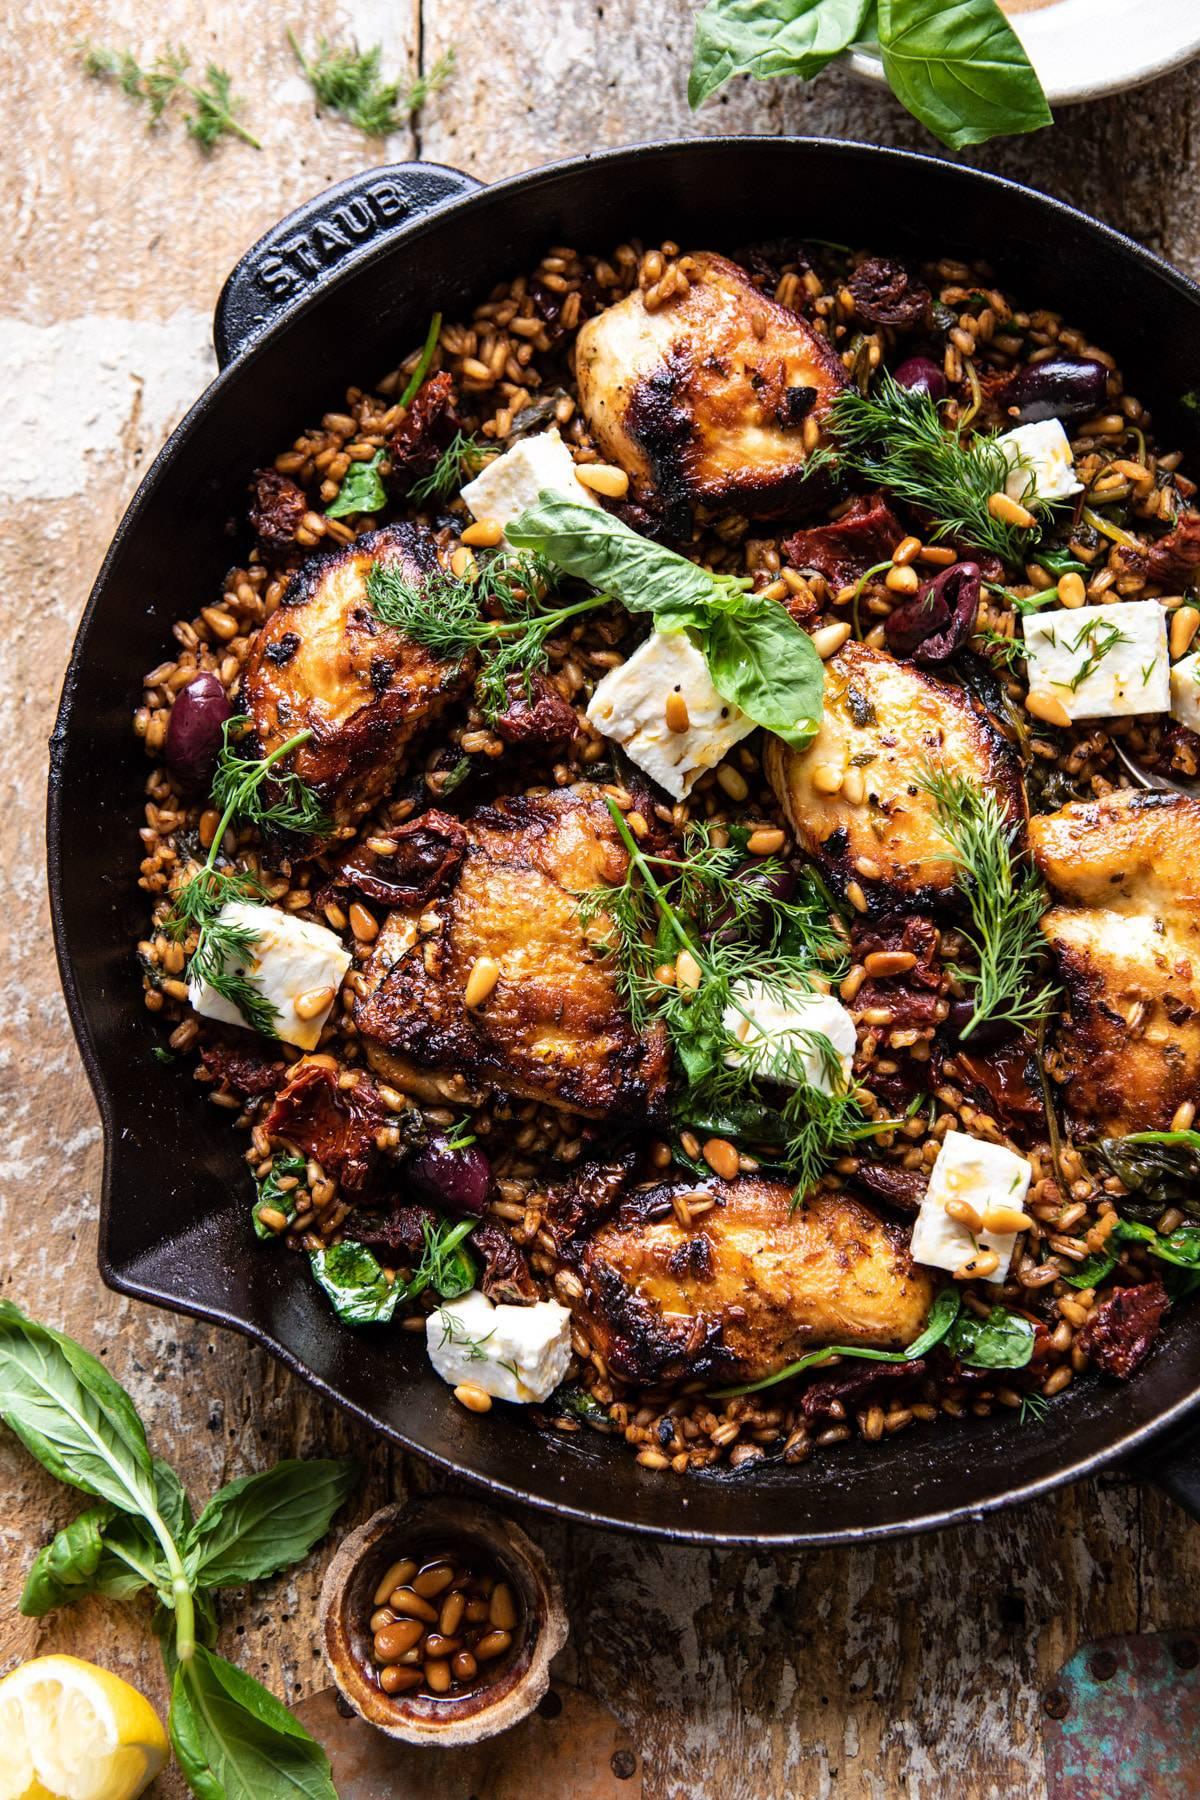 One Skillet Greek Sun-Dried Tomato Chicken and Farro | halfbakedharvest.com #skilletrecipes #chicken #healthyrecipes #onepan #easyrecipes